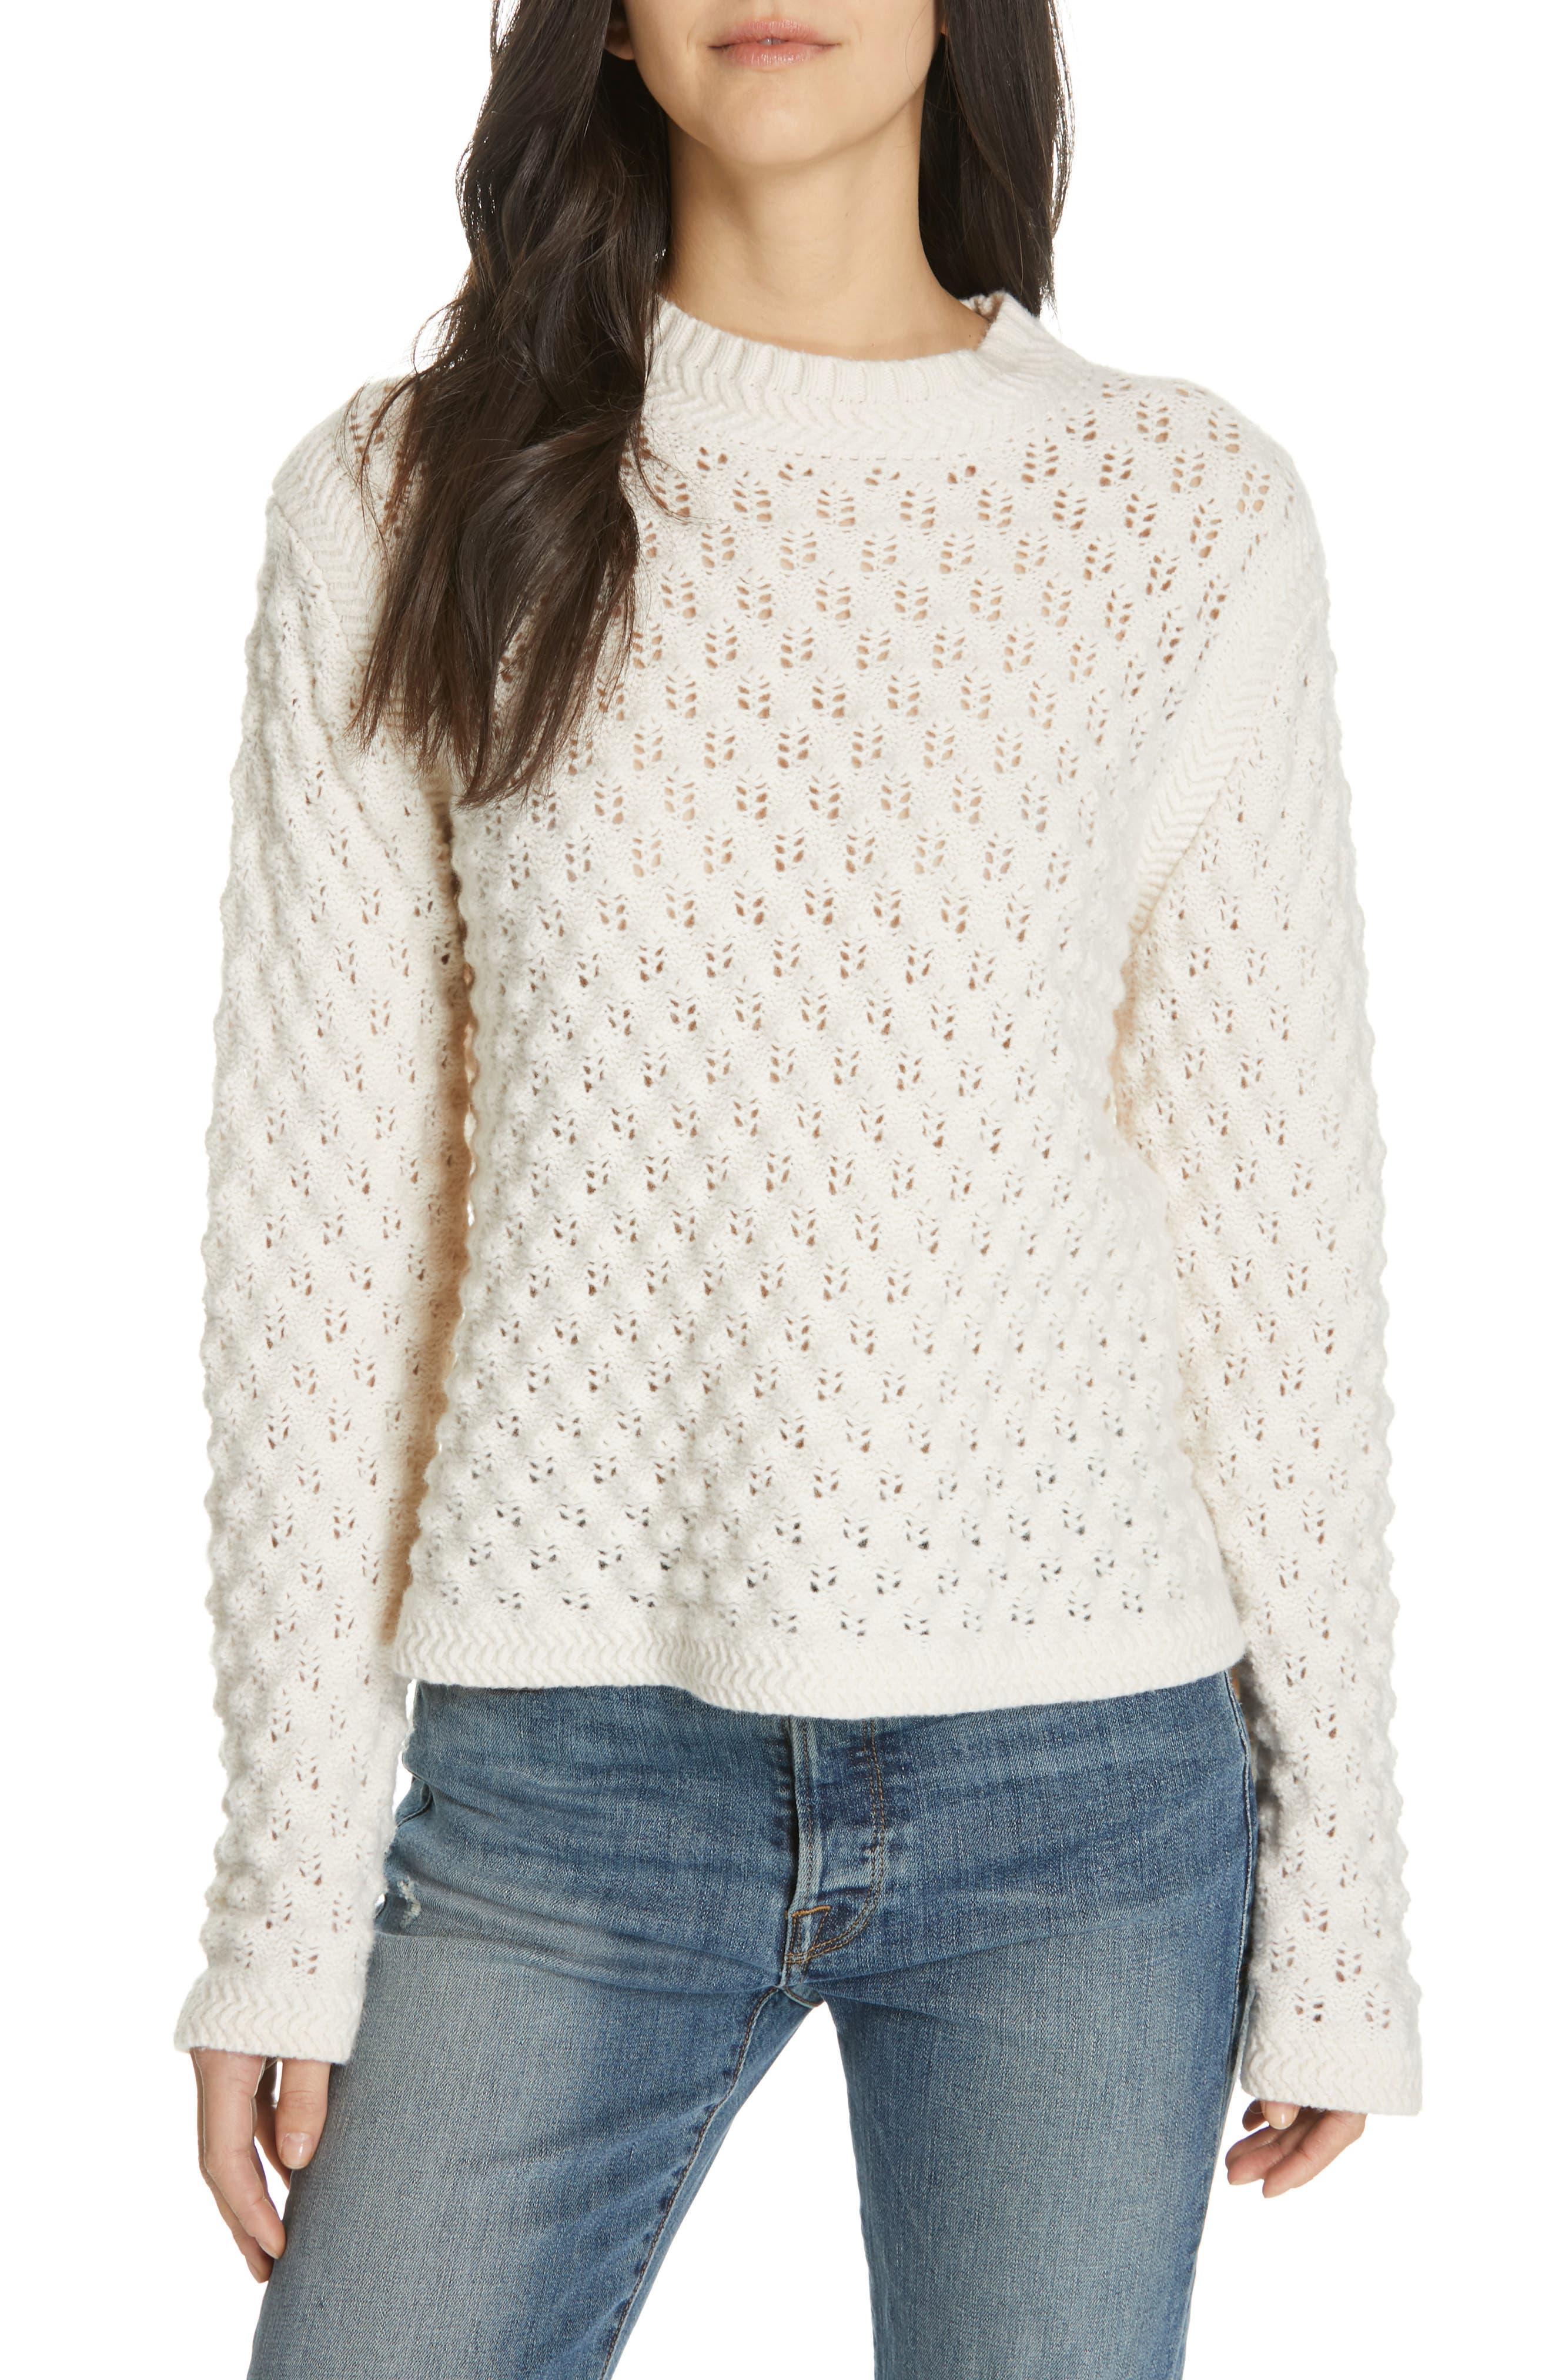 LA VIE REBECCA TAYLOR Pointelle Sweater in Ecru